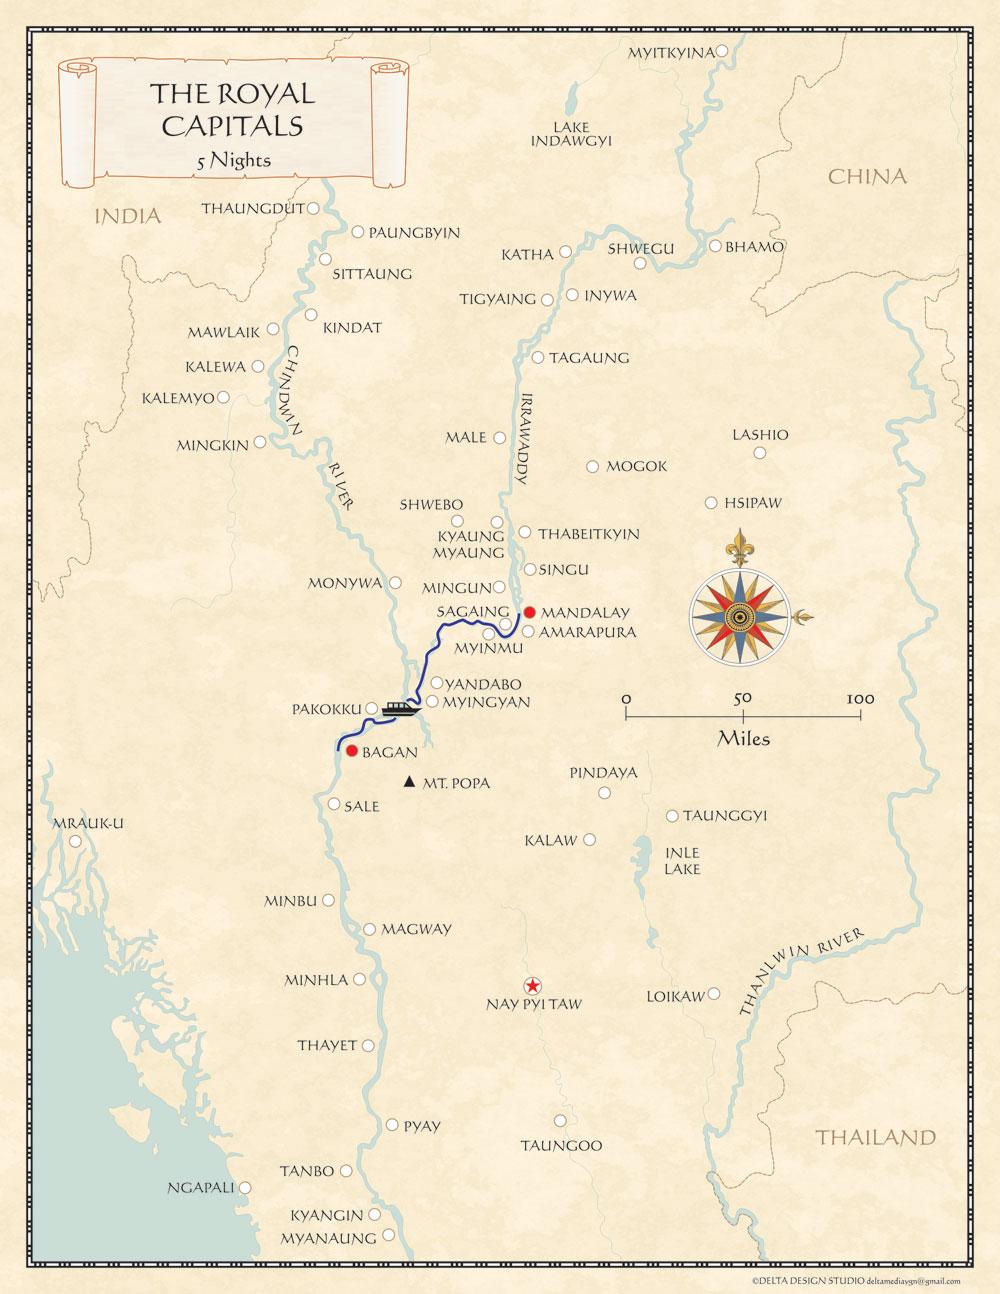 Paukan 2007 Myanmar Cruise Map